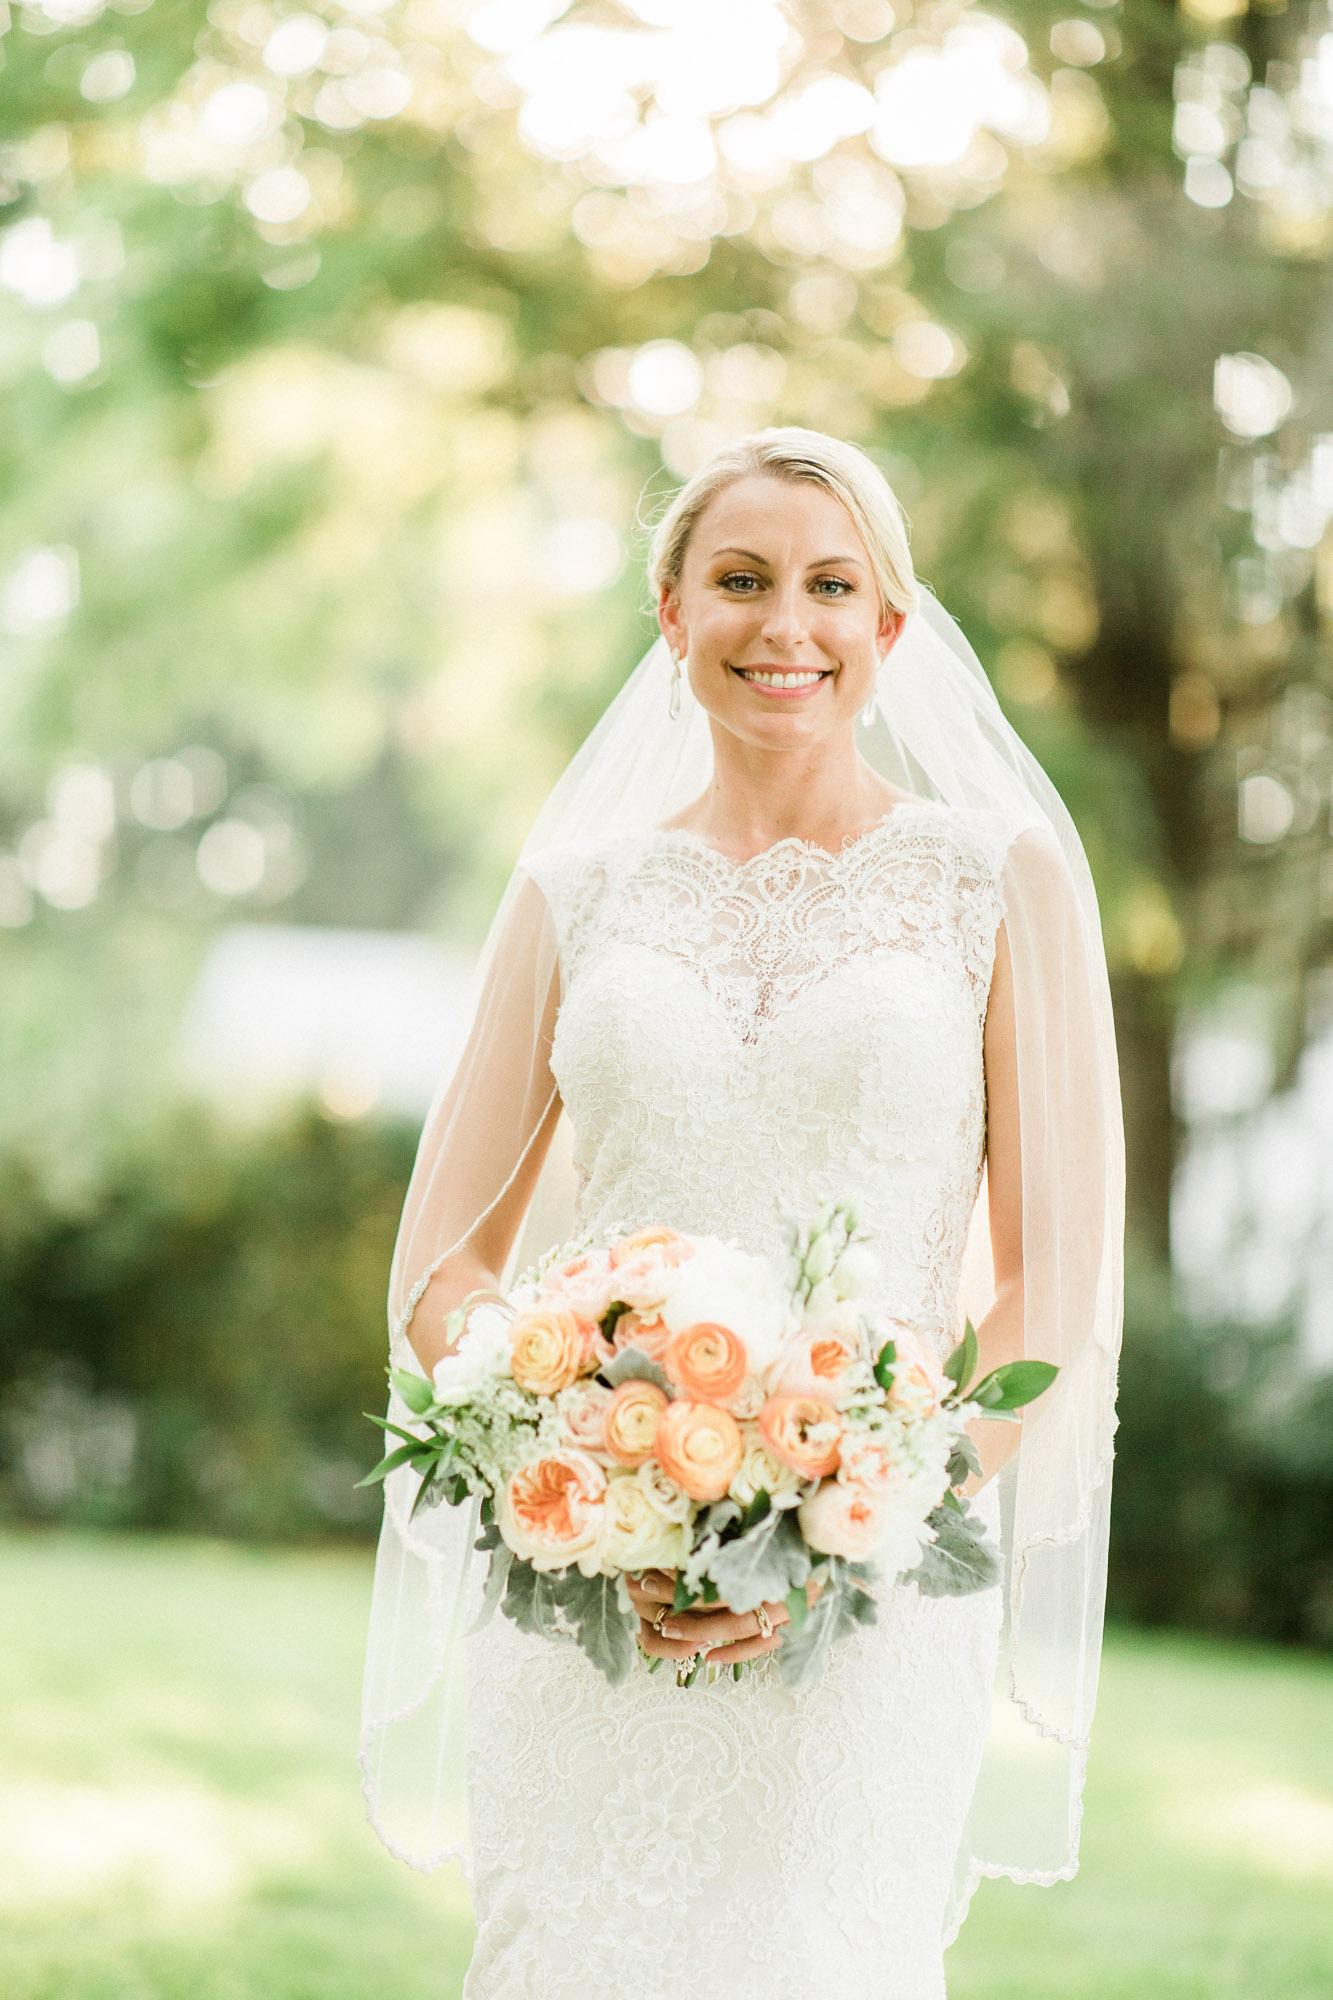 Allenberry-resort-historic-pennsylvania-wedding-22379.jpg